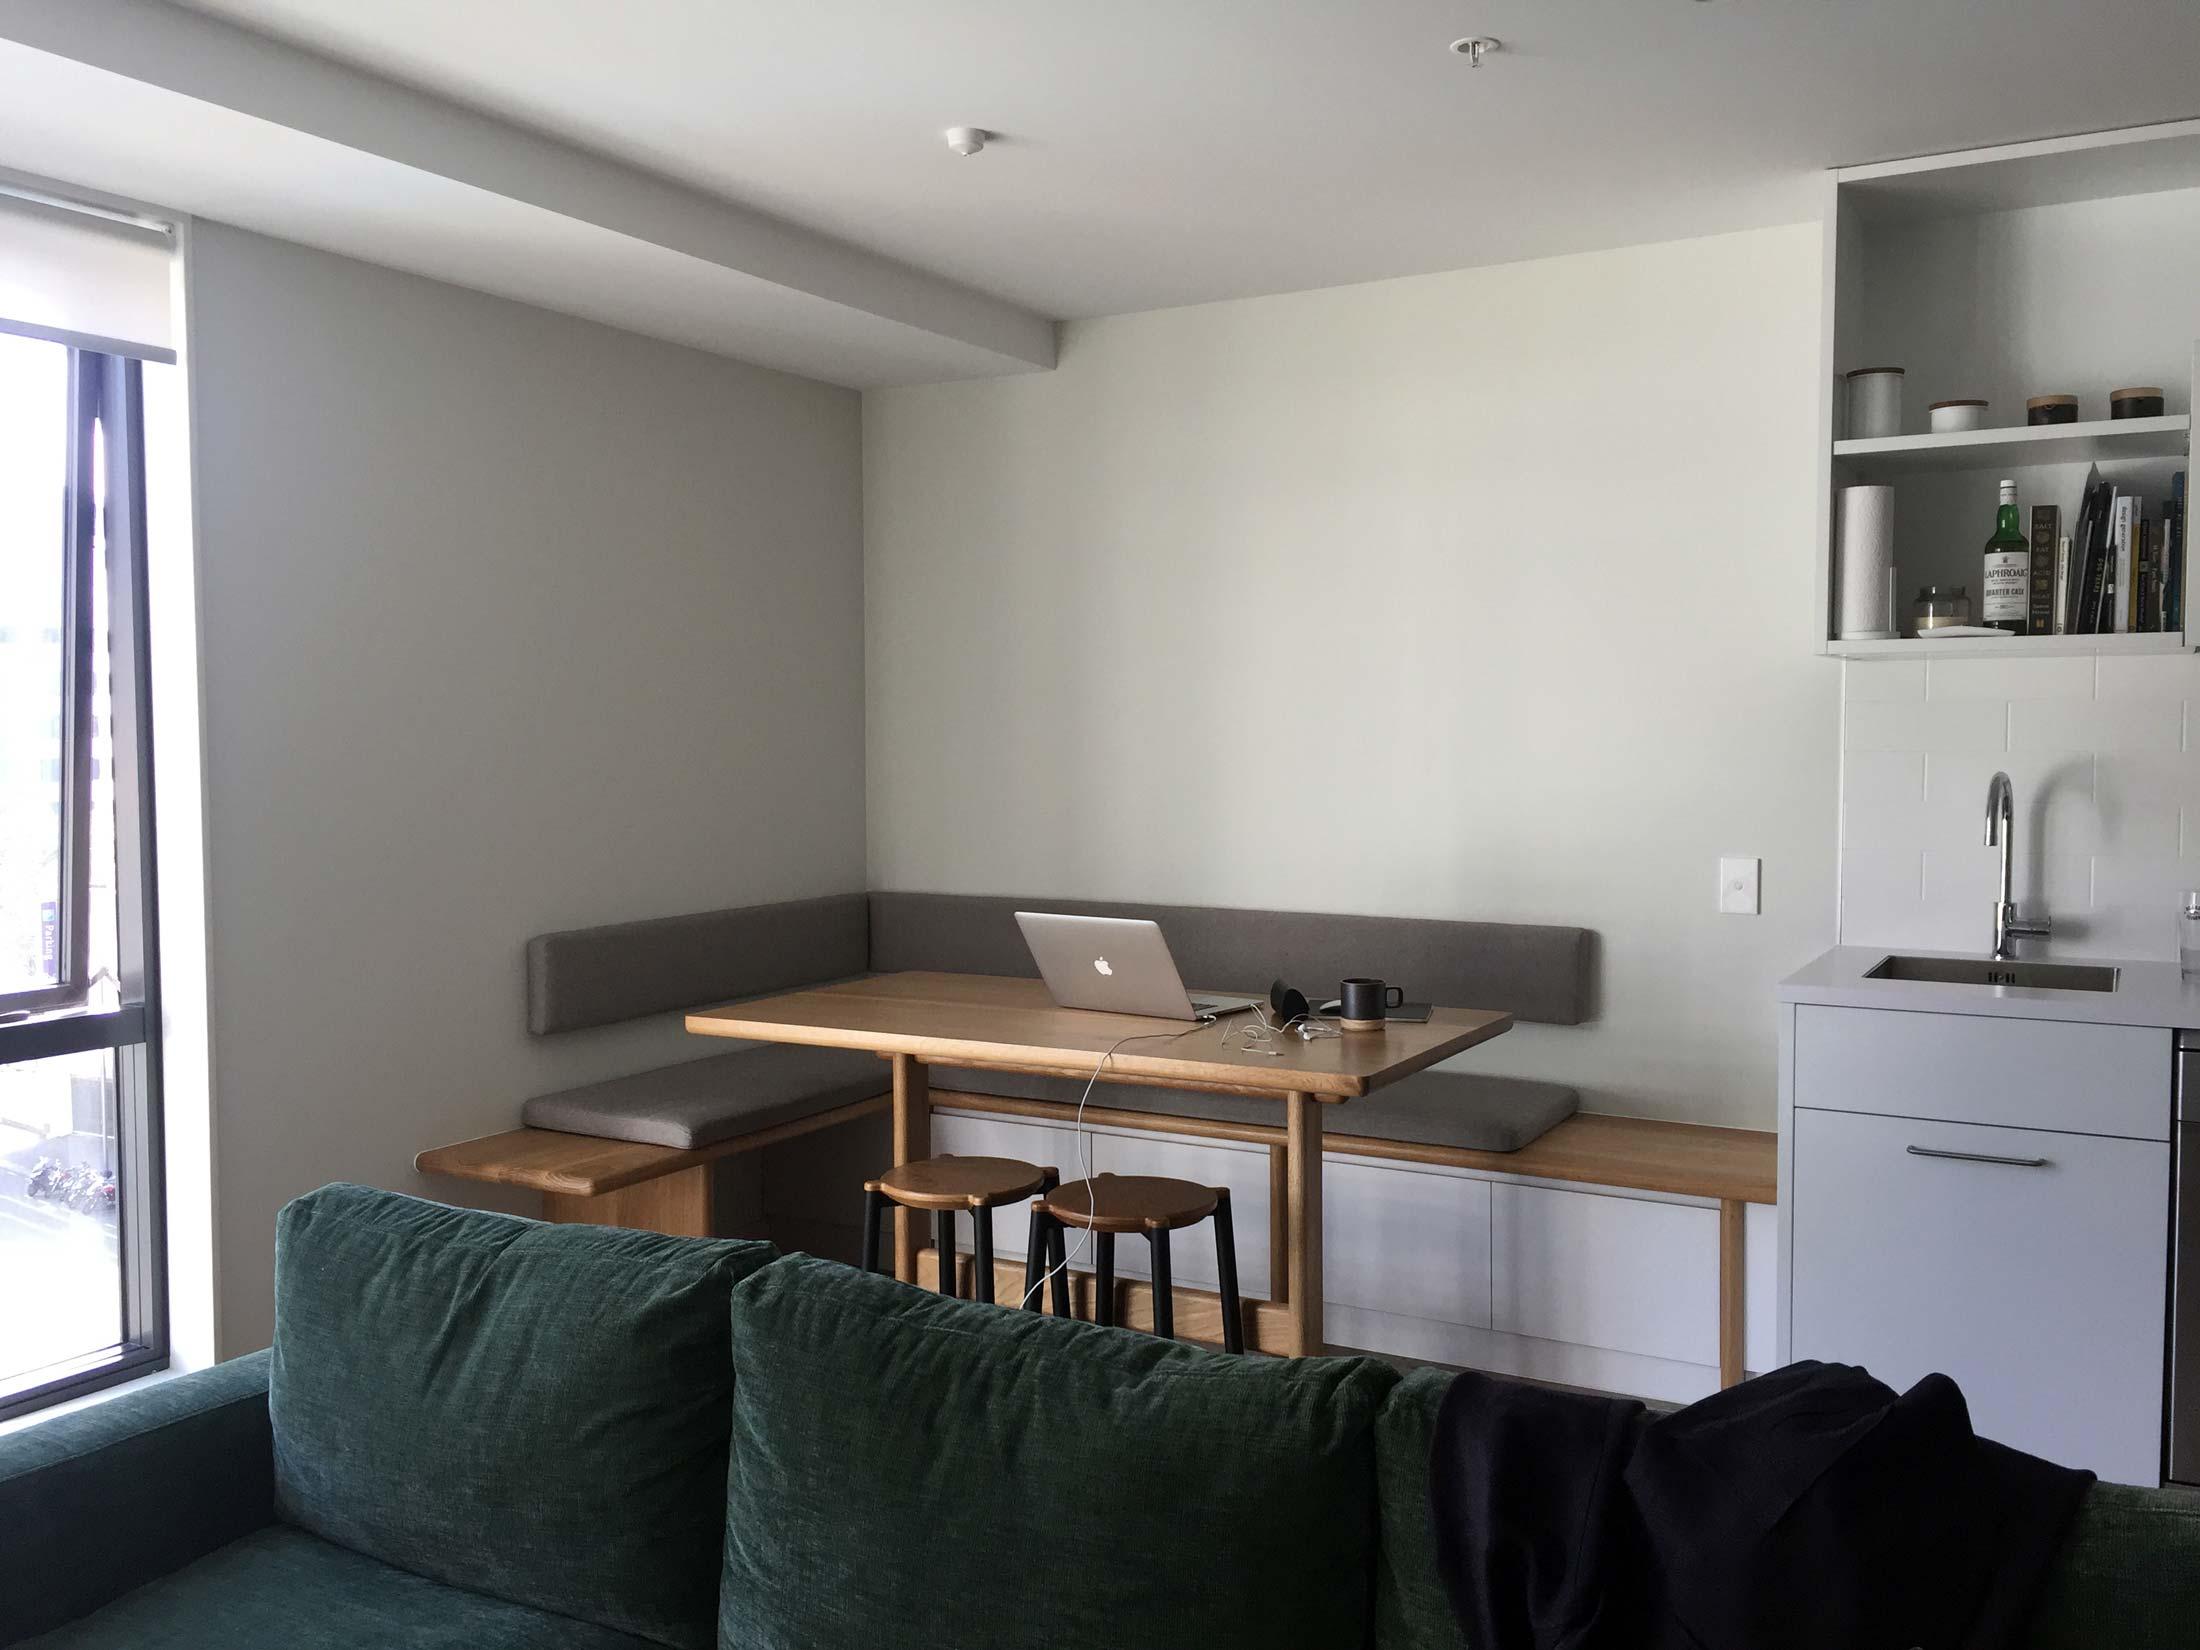 Urban bach - Wellington, New ZealandProject life: 2017 - present